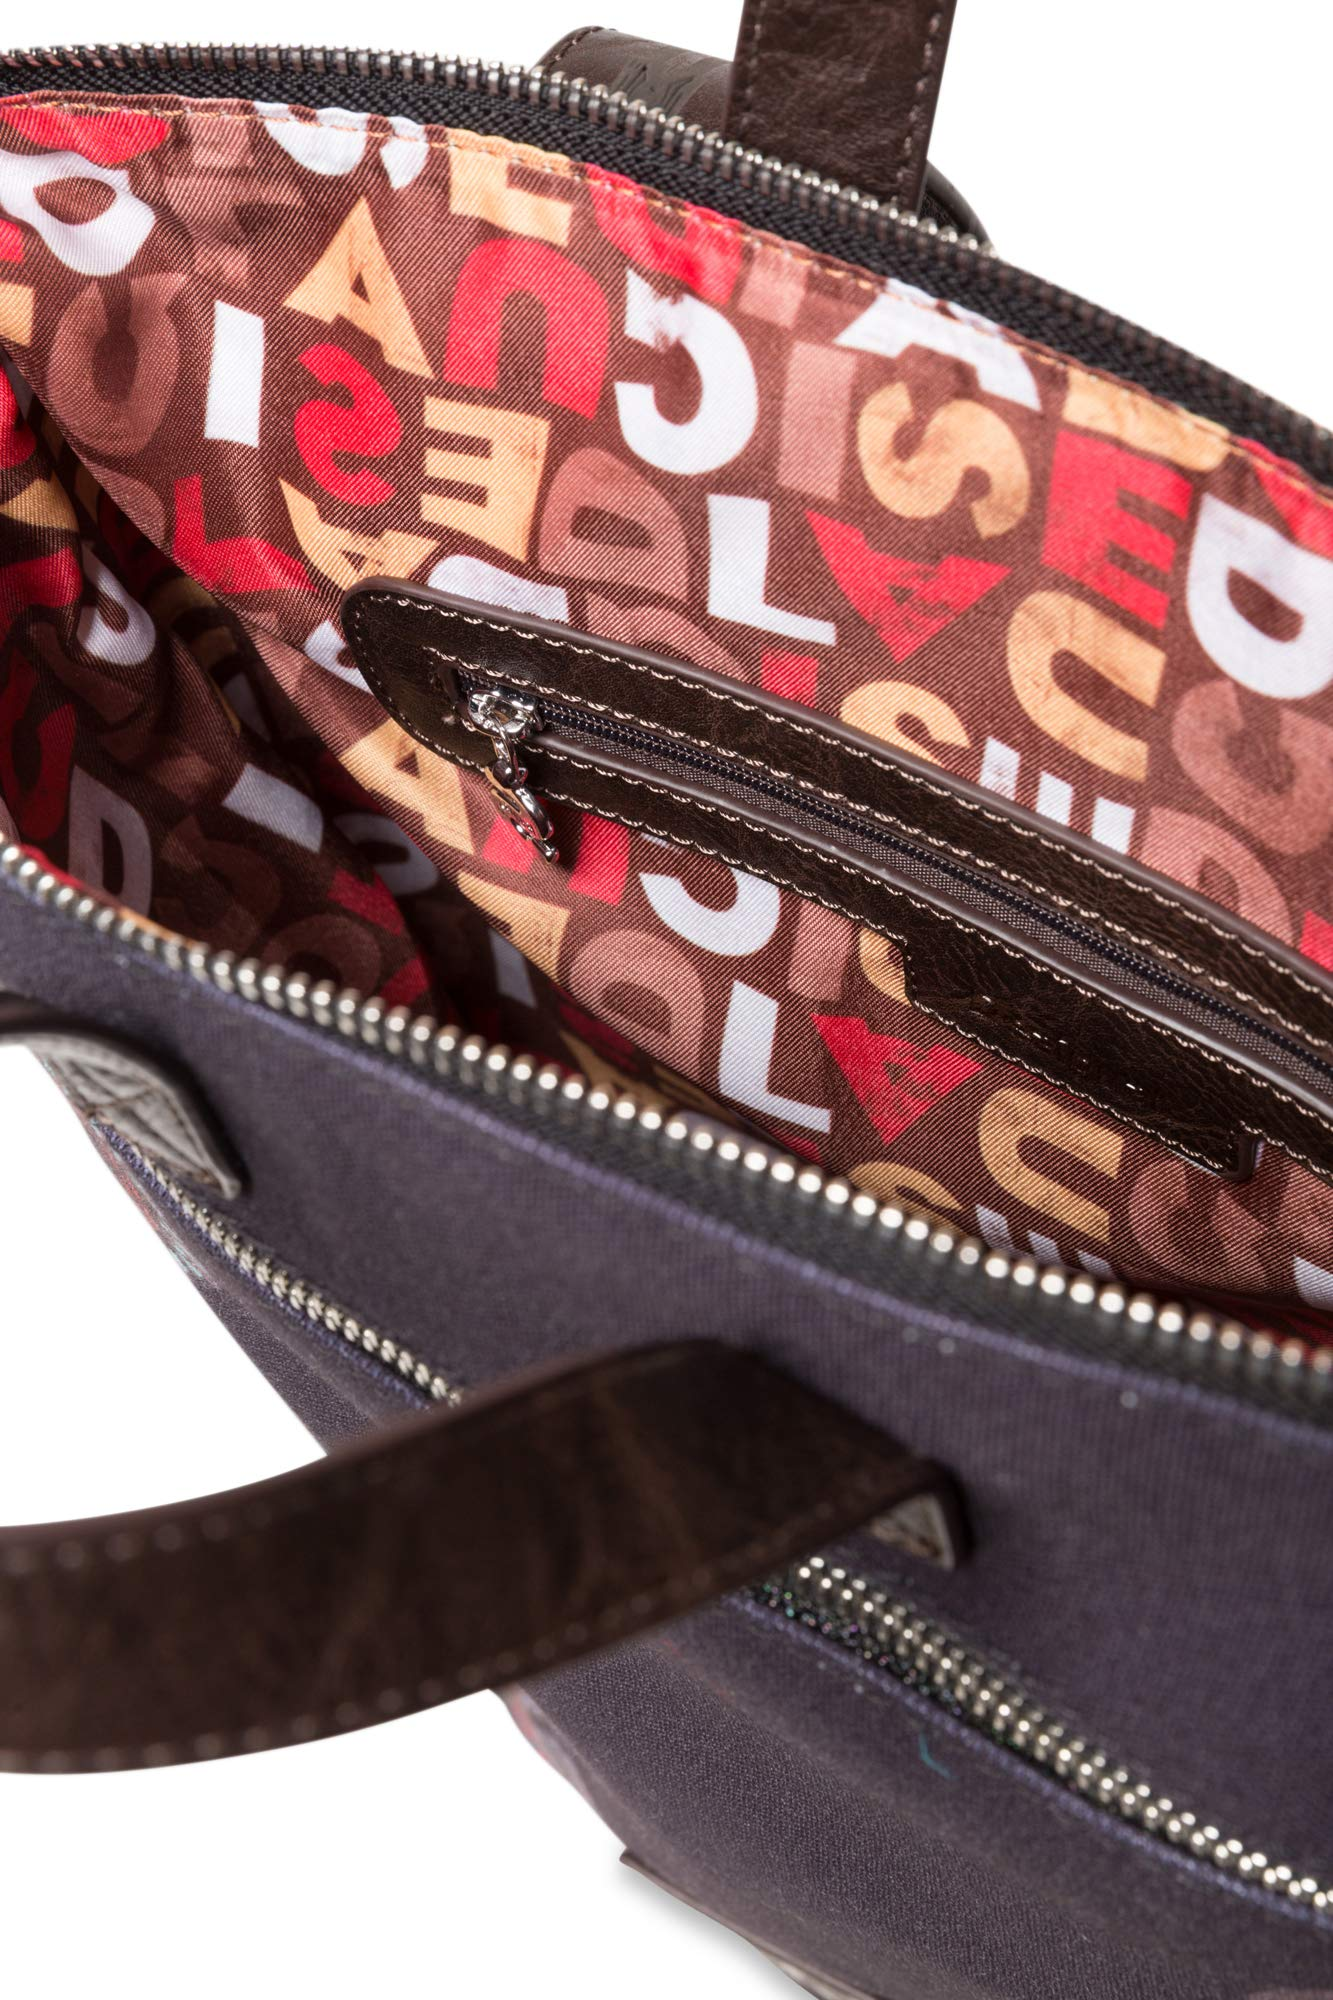 B x H x T Desigual 19WAKA07 Bolso mochila de Sint/ético Mujer 37x9x24 cm